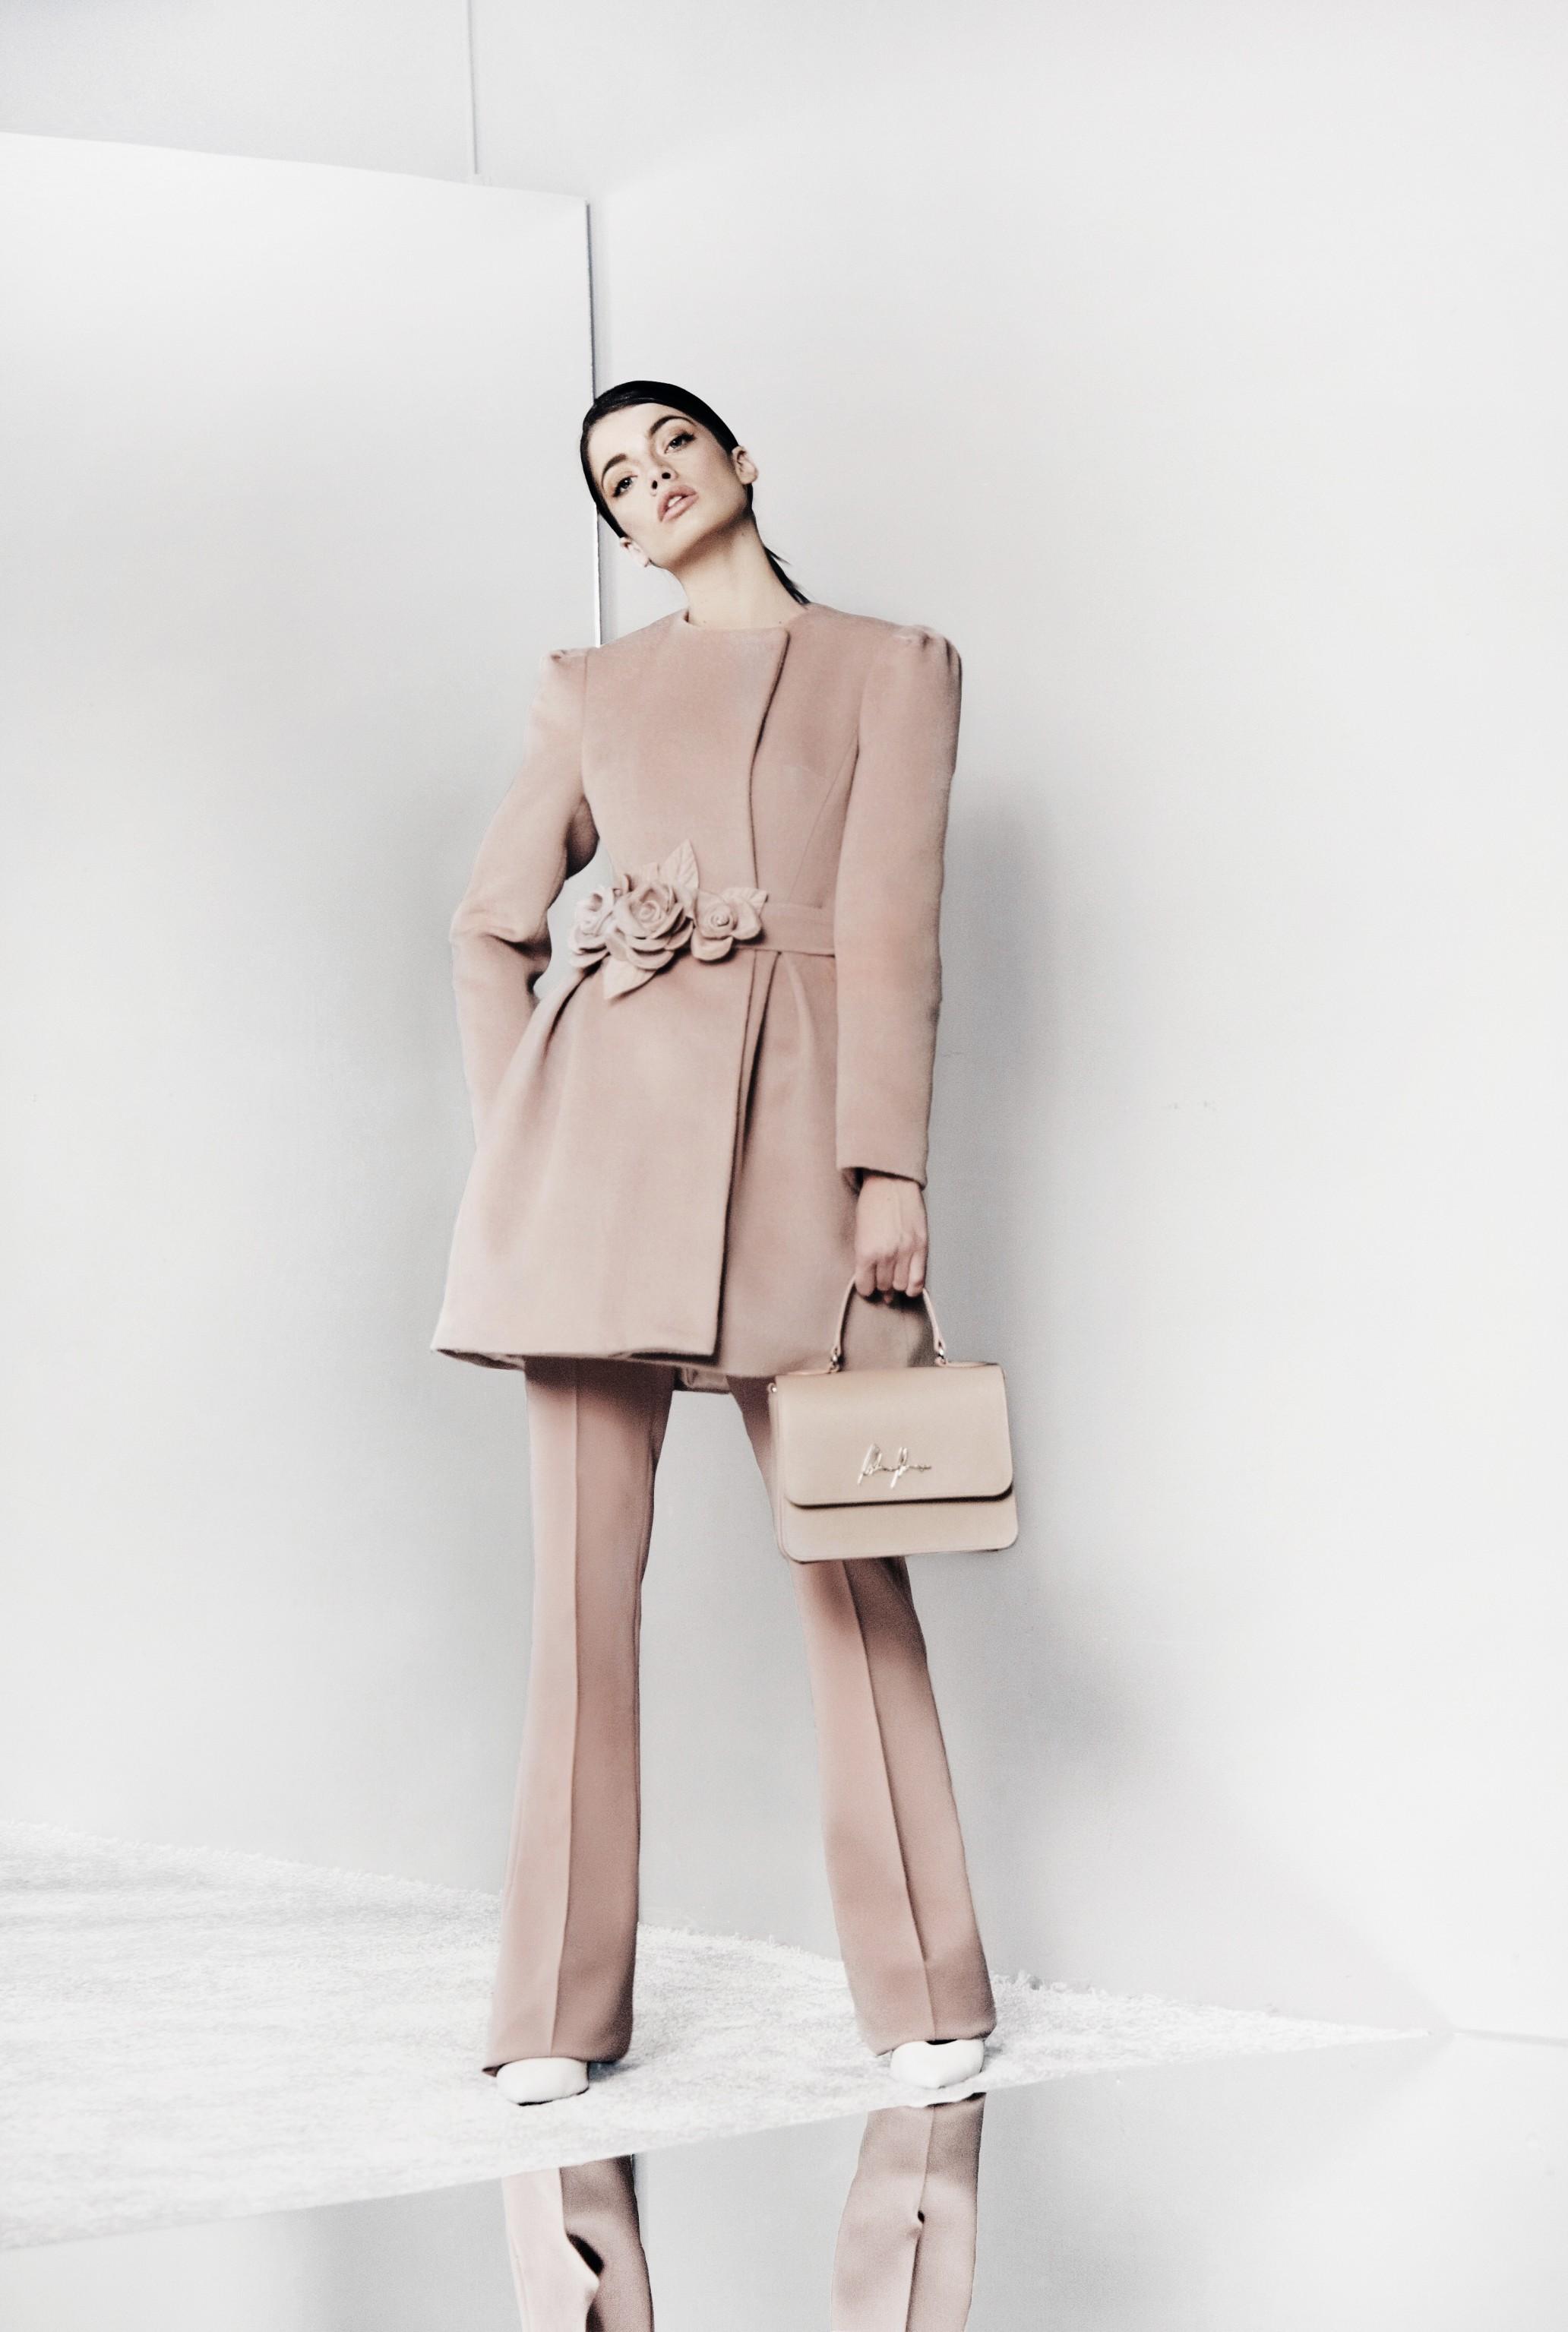 Fashion Inspiration: The Mihano Momosa Pre-Fall 2018 Collection